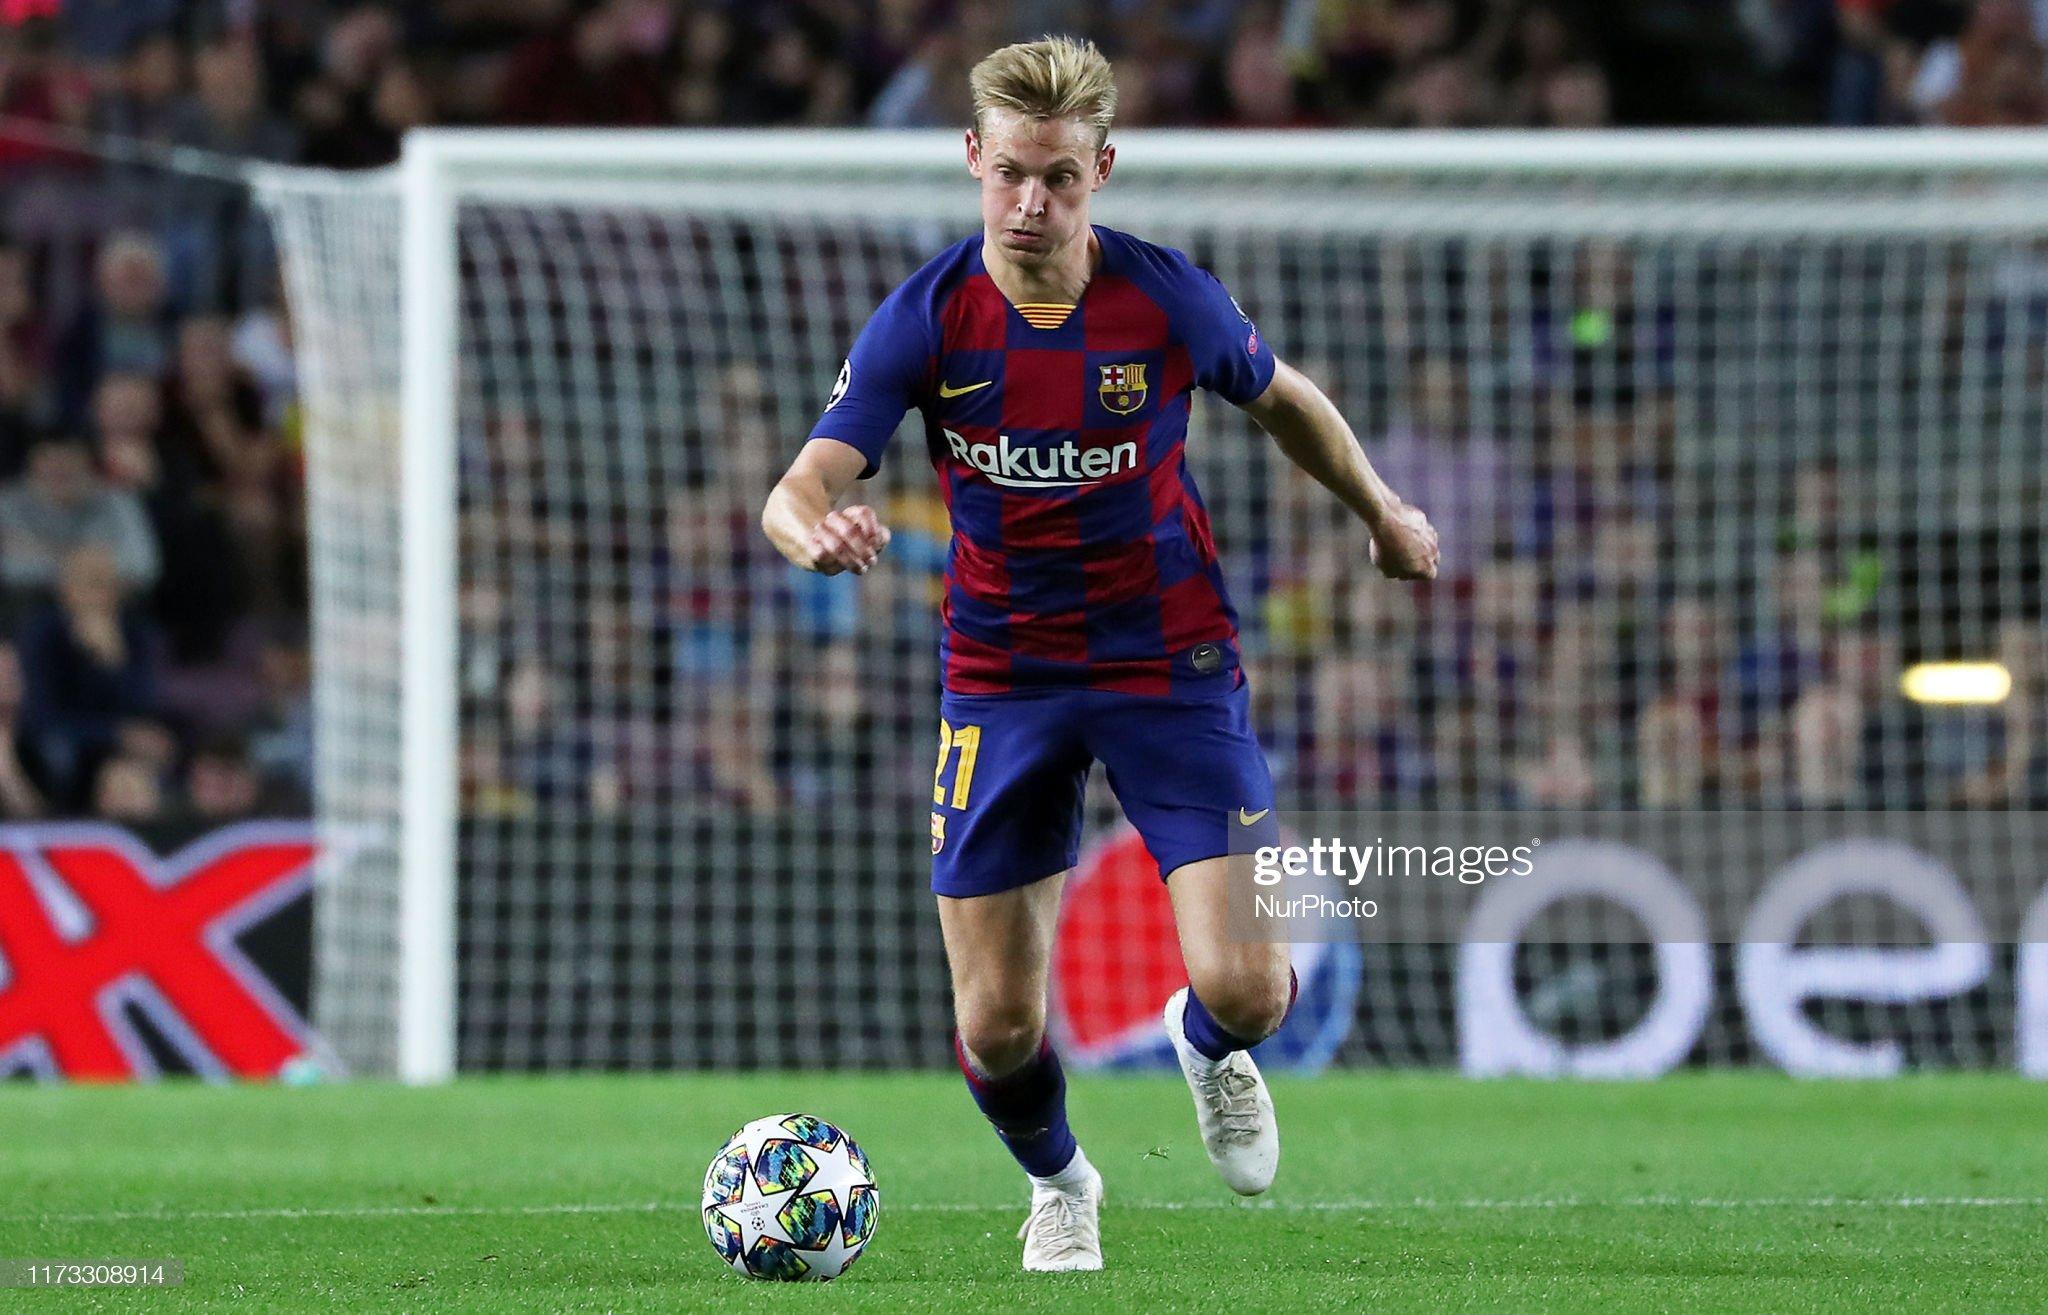 صور مباراة : برشلونة - إنتر 2-1 ( 02-10-2019 )  Frenkie-de-jong-during-the-match-between-fc-barcelona-between-inter-picture-id1173308914?s=2048x2048